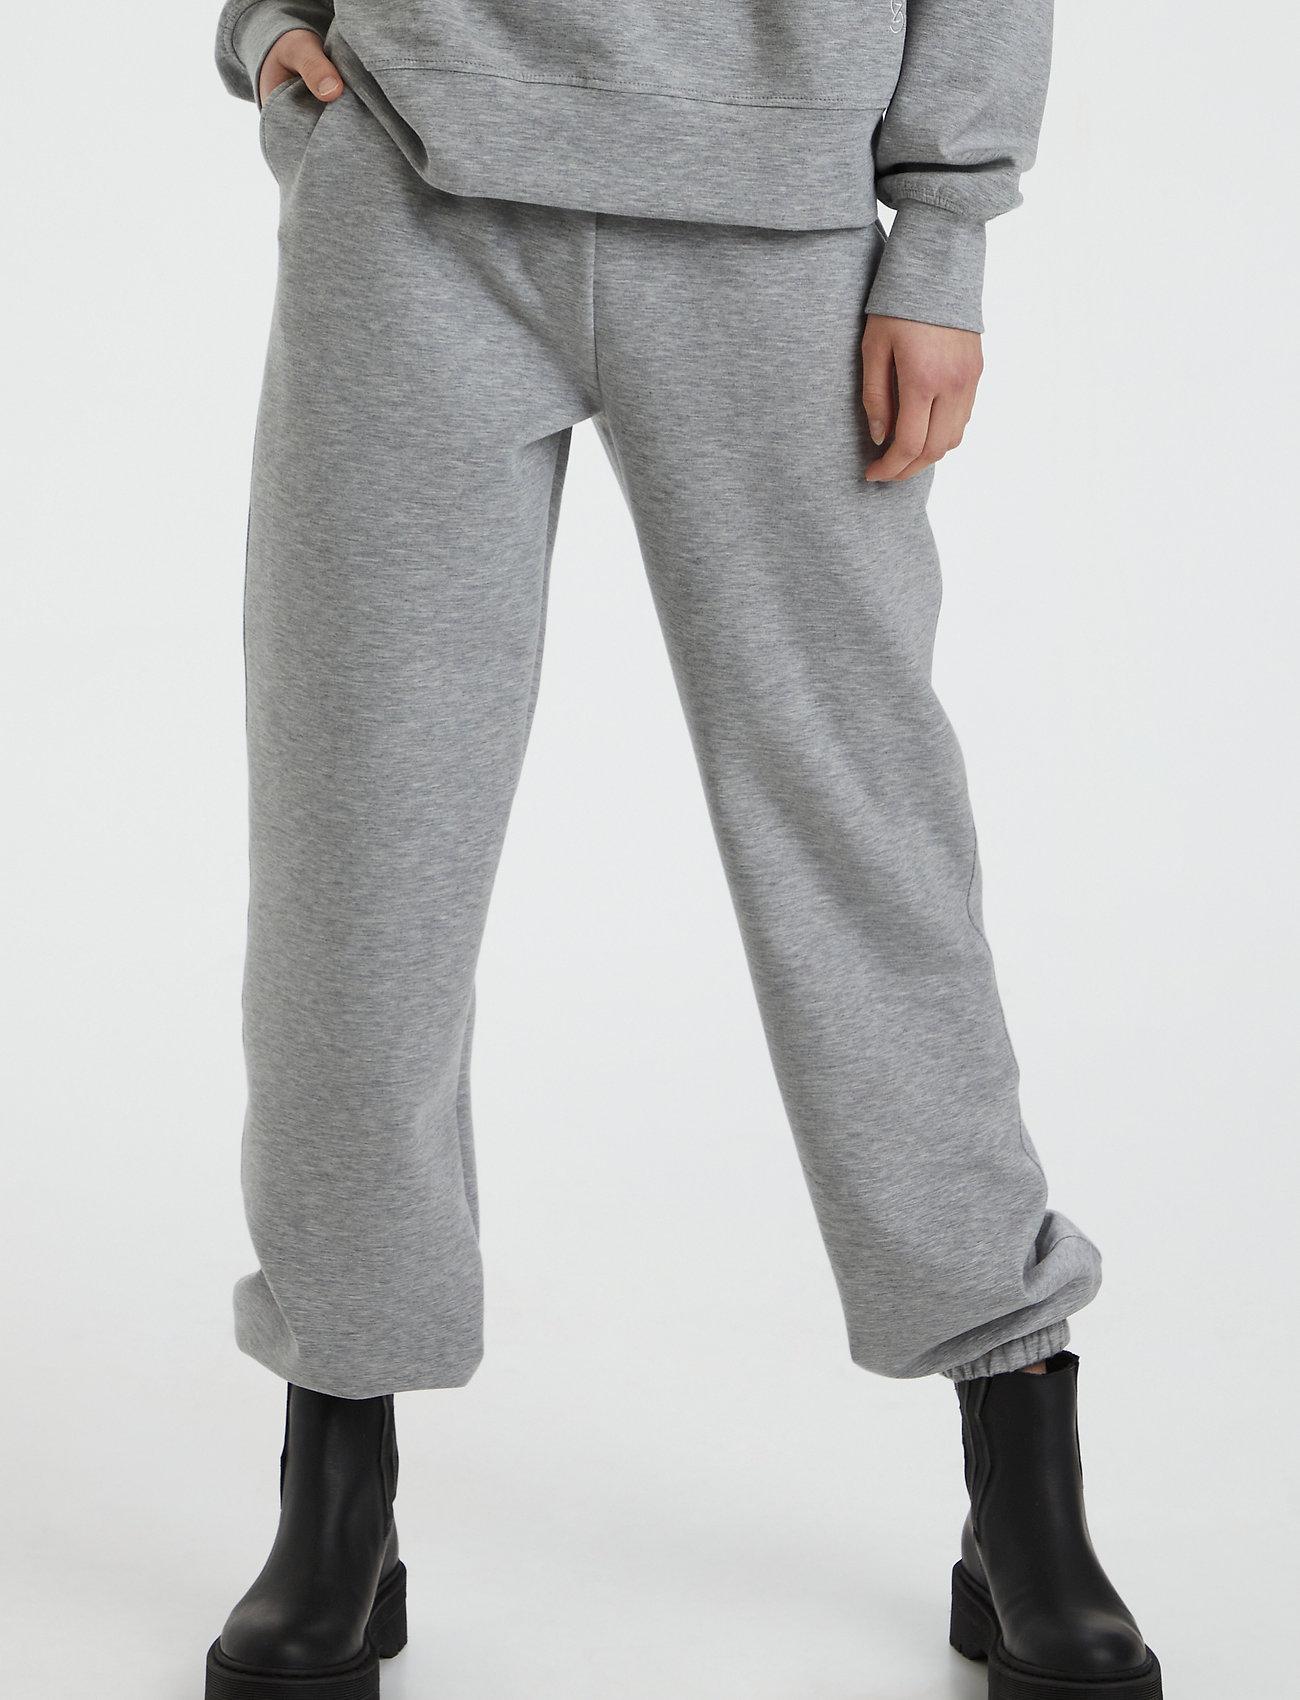 Gestuz - ChrisdaGZ MEL sweatpants - sweatpants - light grey melange - 0